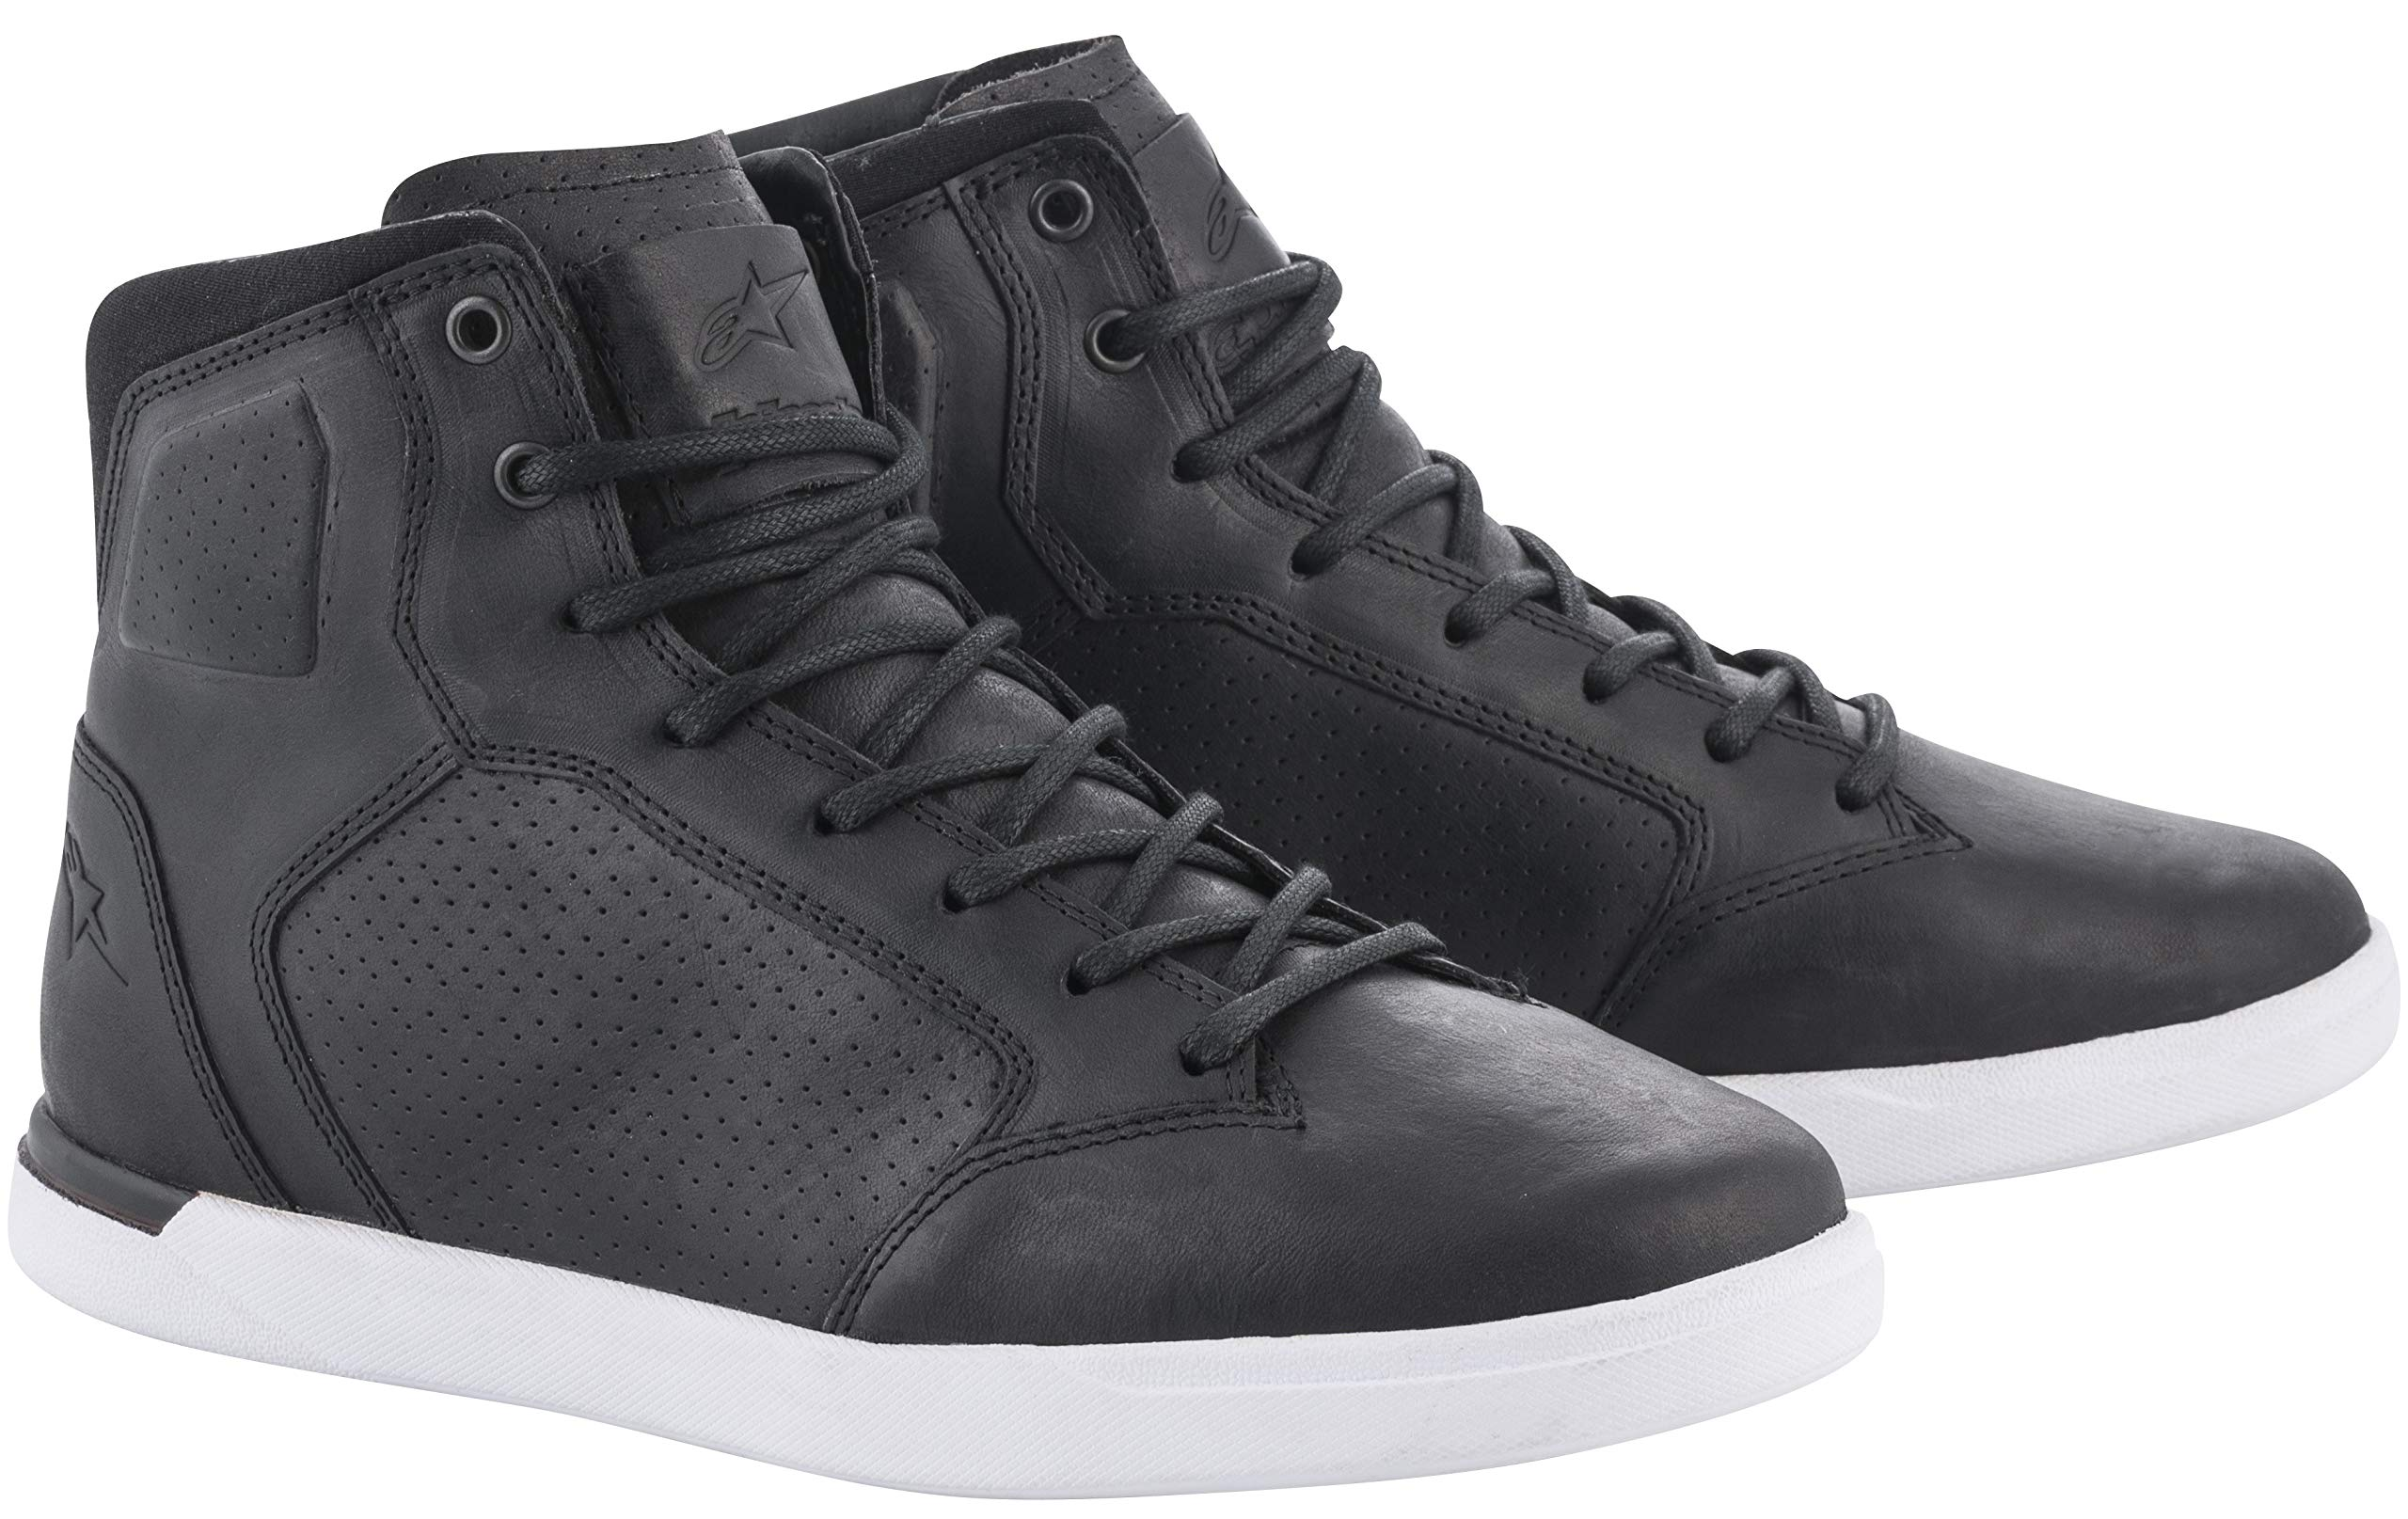 Alpinestars J-Cult Shoe (13.5, Black)